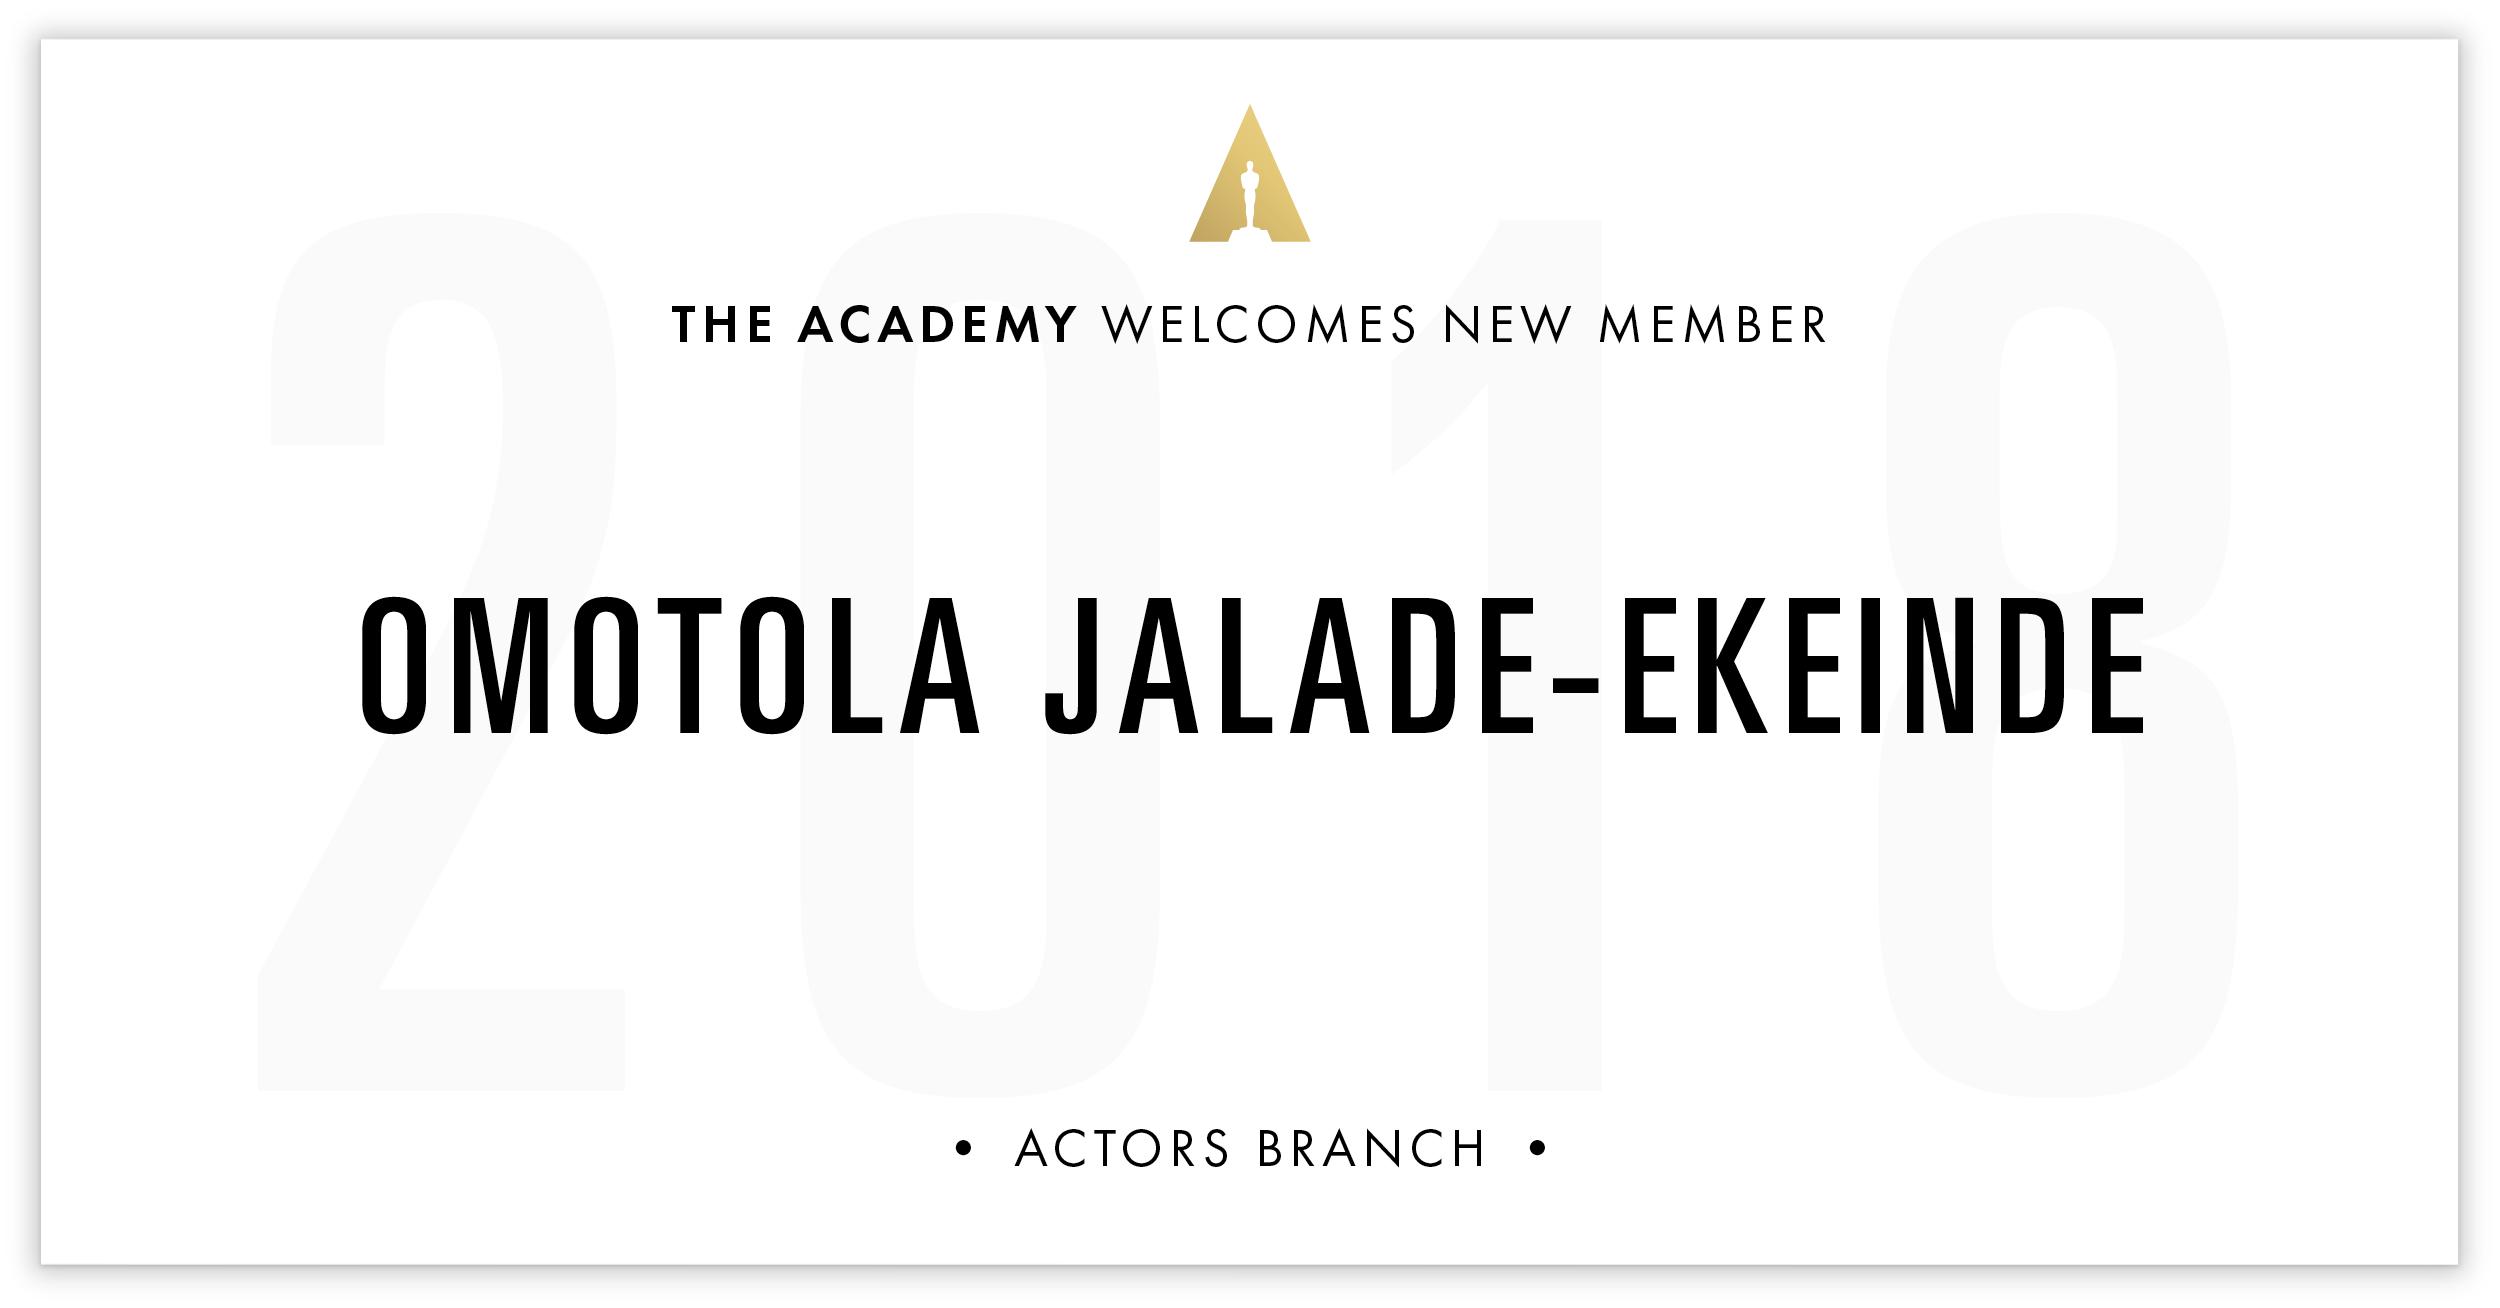 Omotola Jalade-Ekeinde is invited!